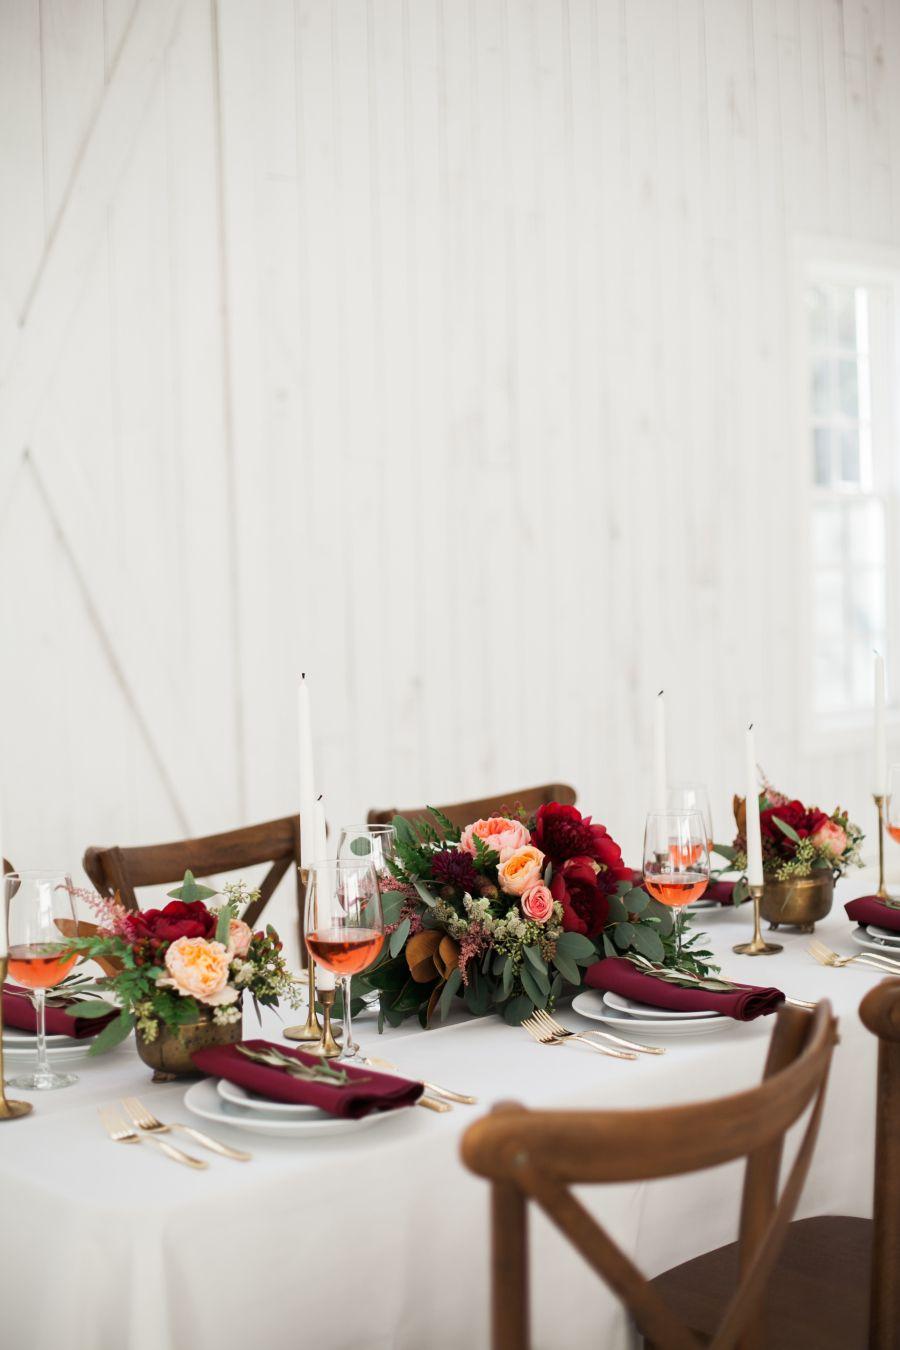 barn wedding, white wedding, red wedding, red flowers, pantone chili oil, russet red, deep red, dark red